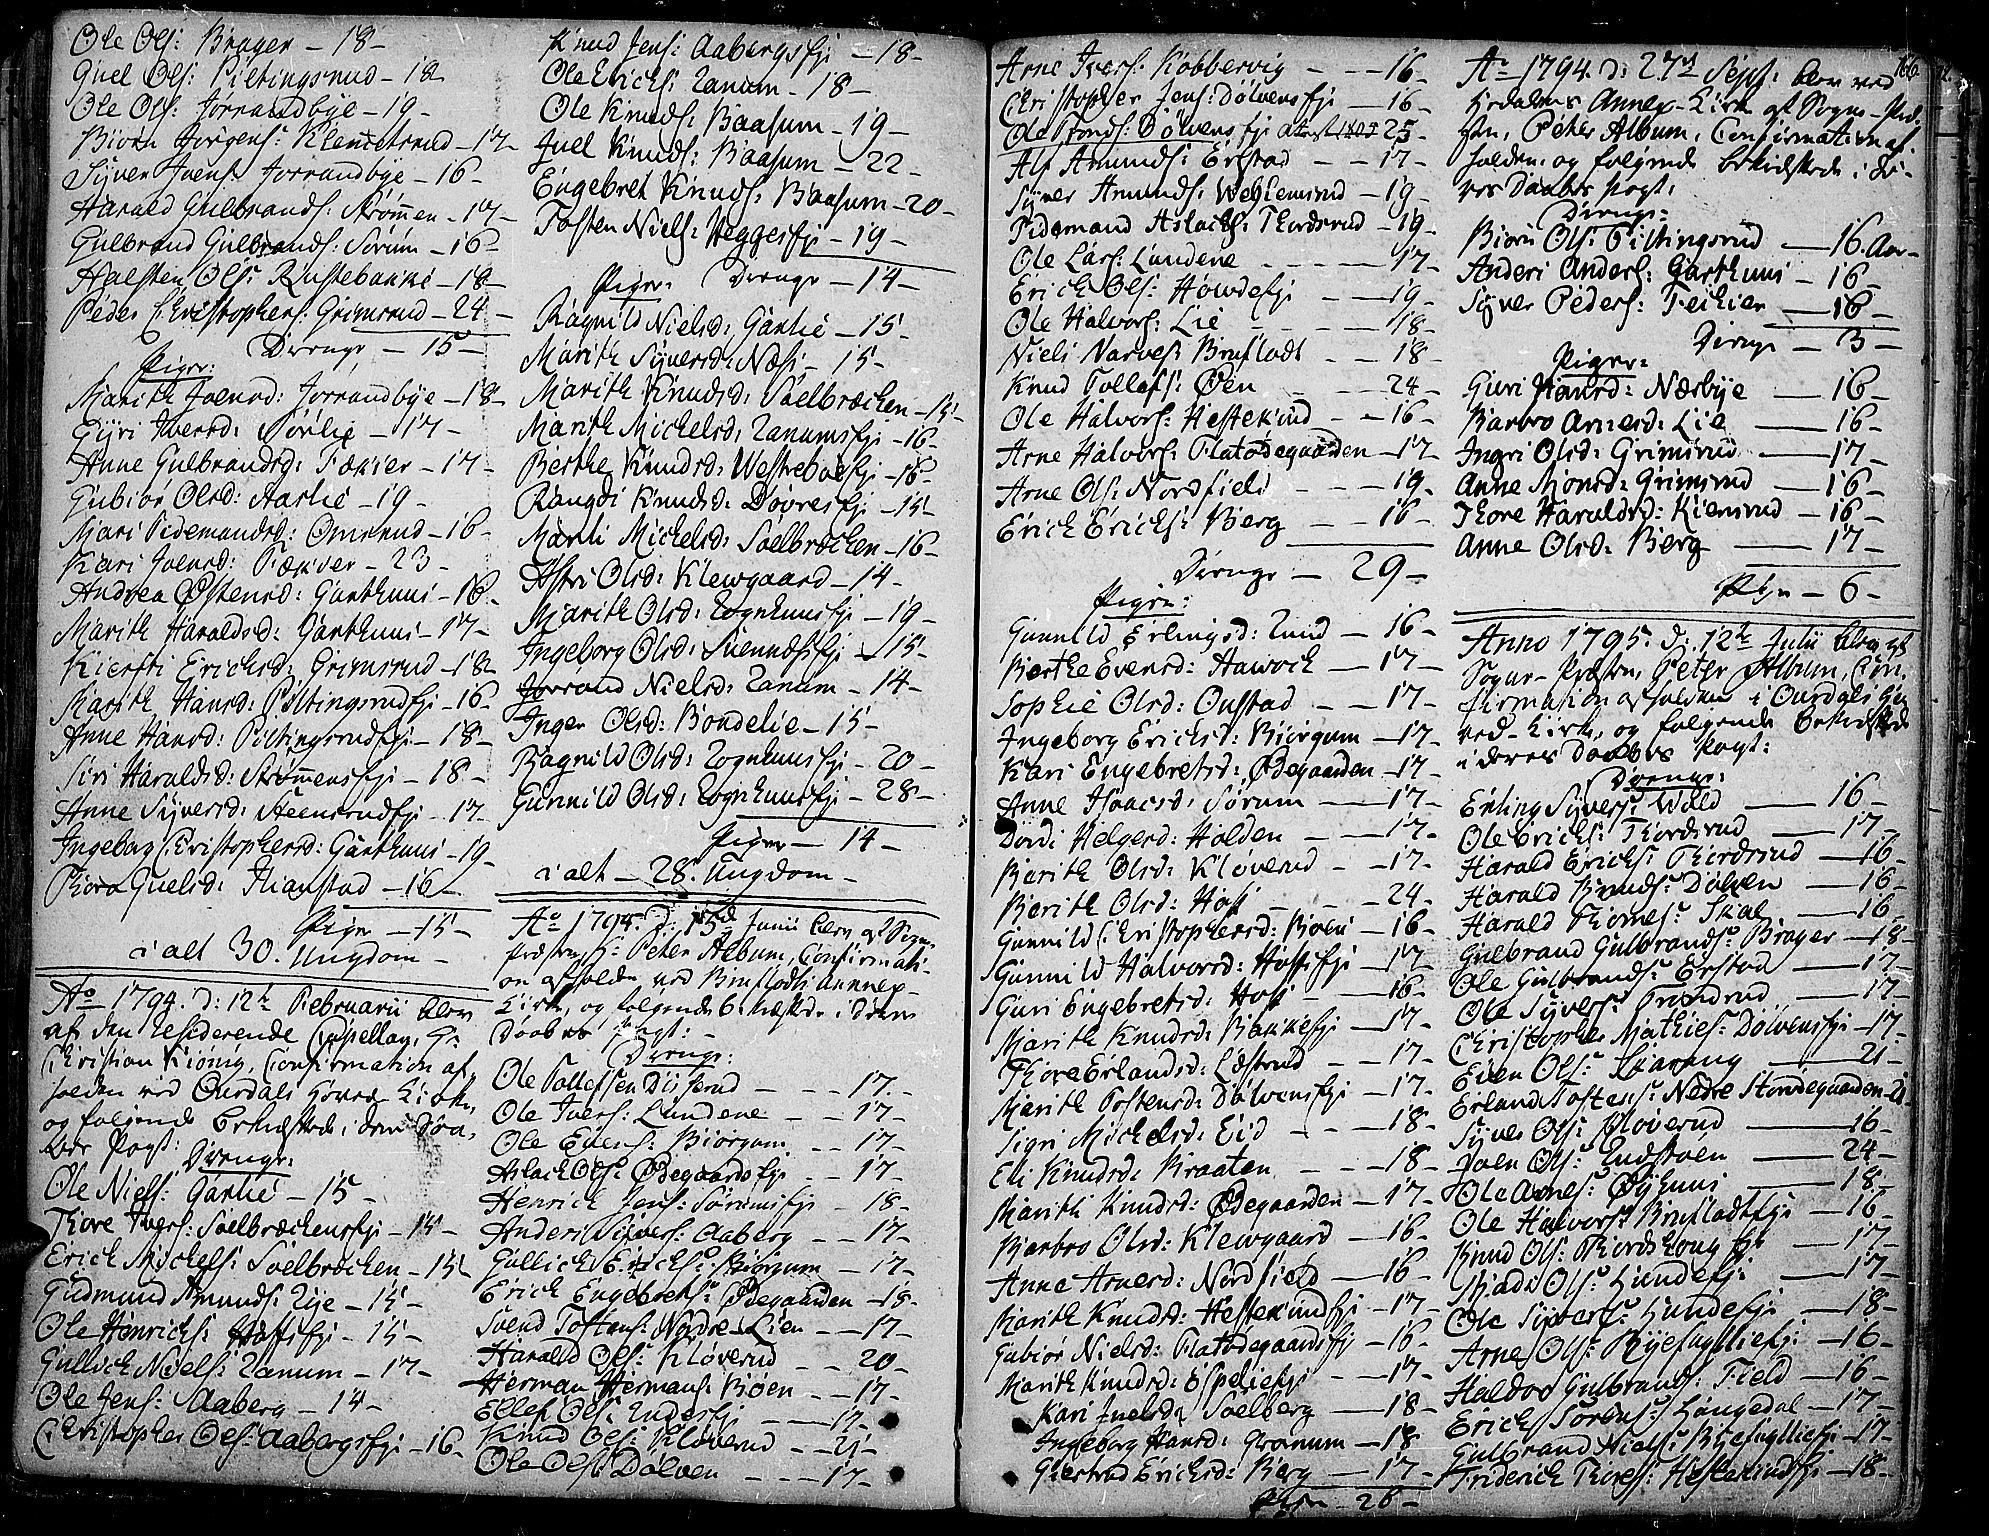 SAH, Aurdal prestekontor, Ministerialbok nr. 6, 1781-1804, s. 166